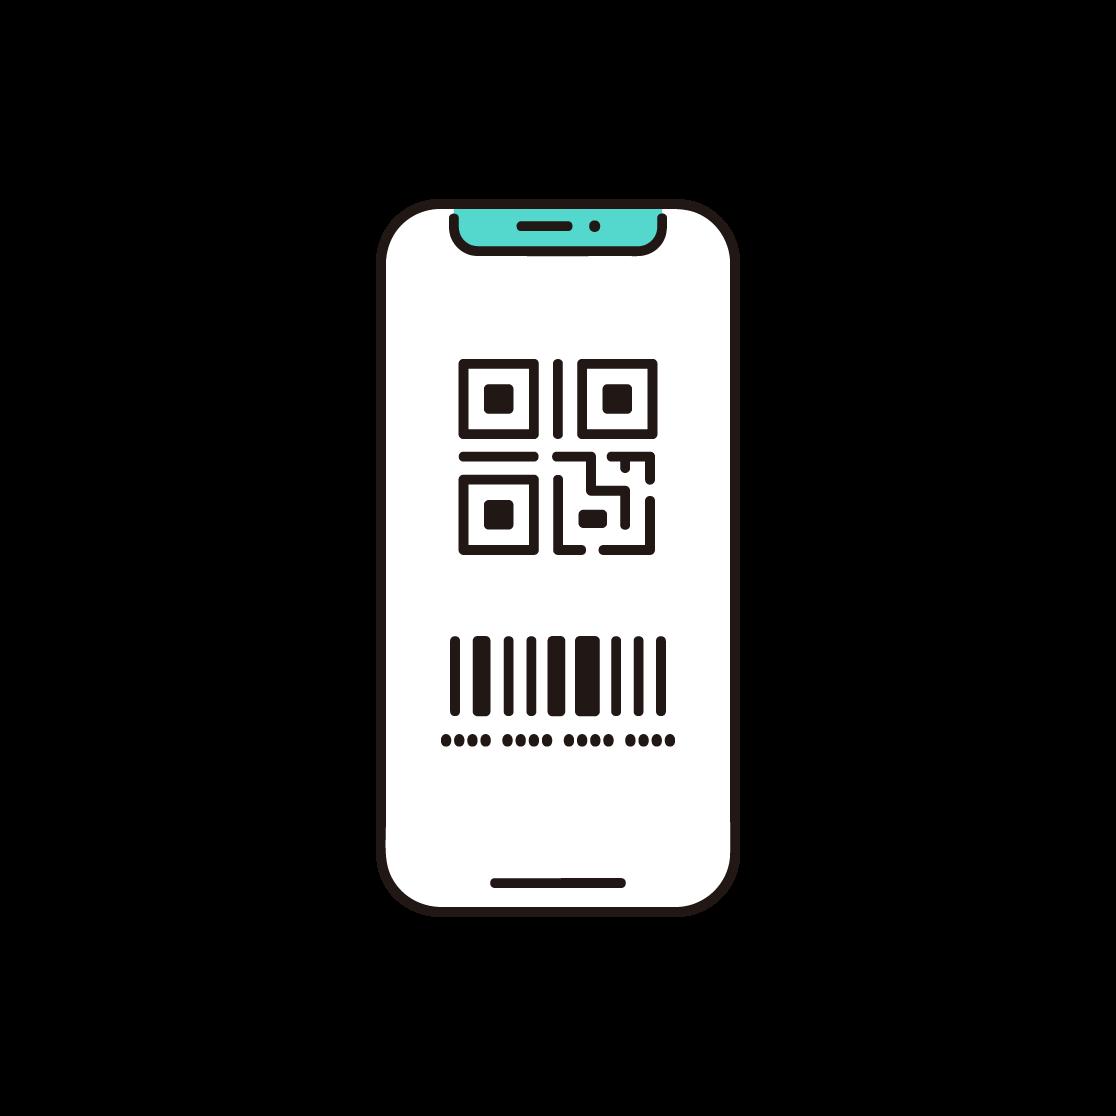 QRコードが表示されたスマホの単色イラスト